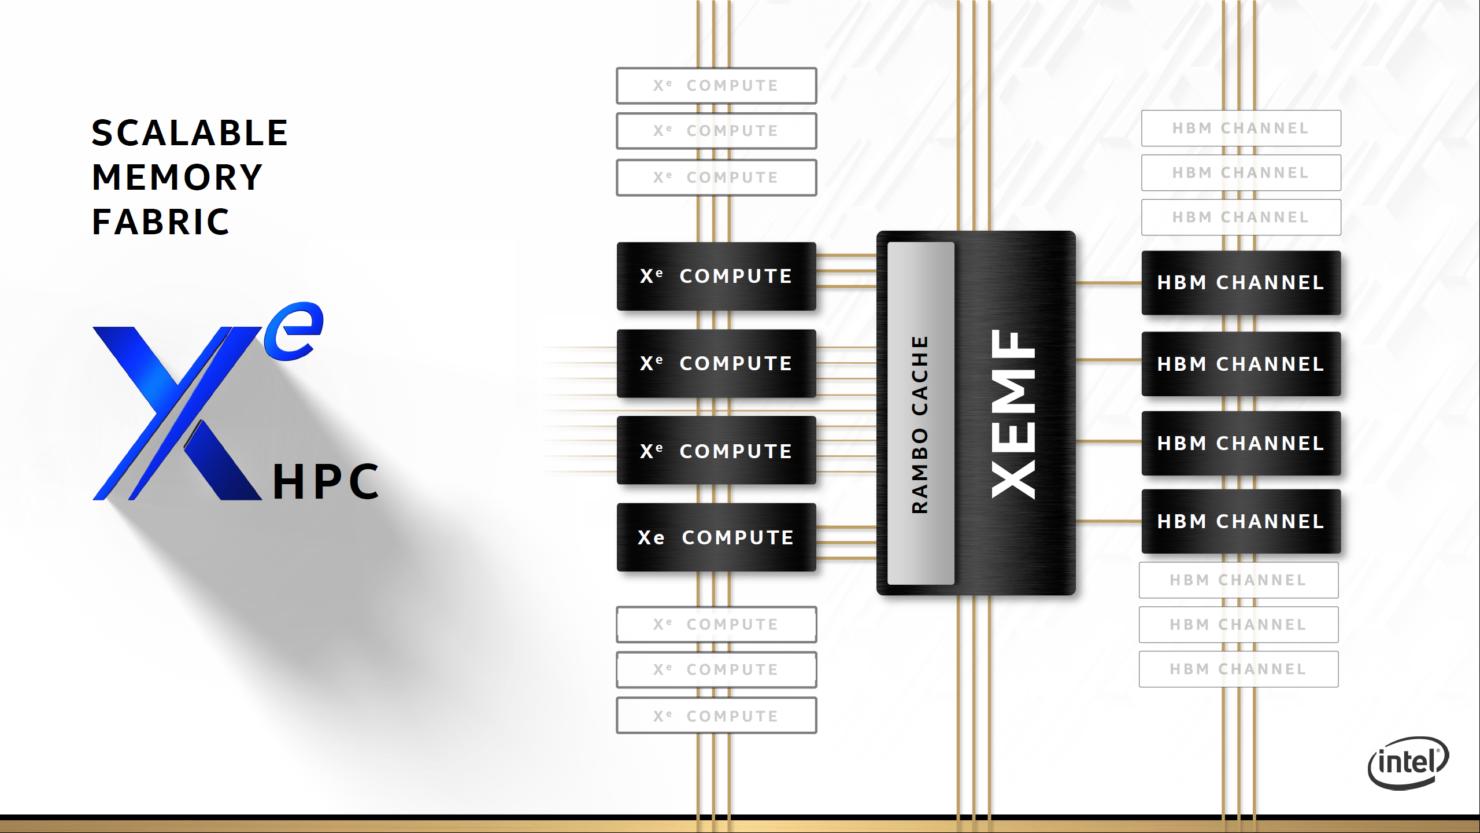 intel-xe-gpu_discrete-graphics-card_26